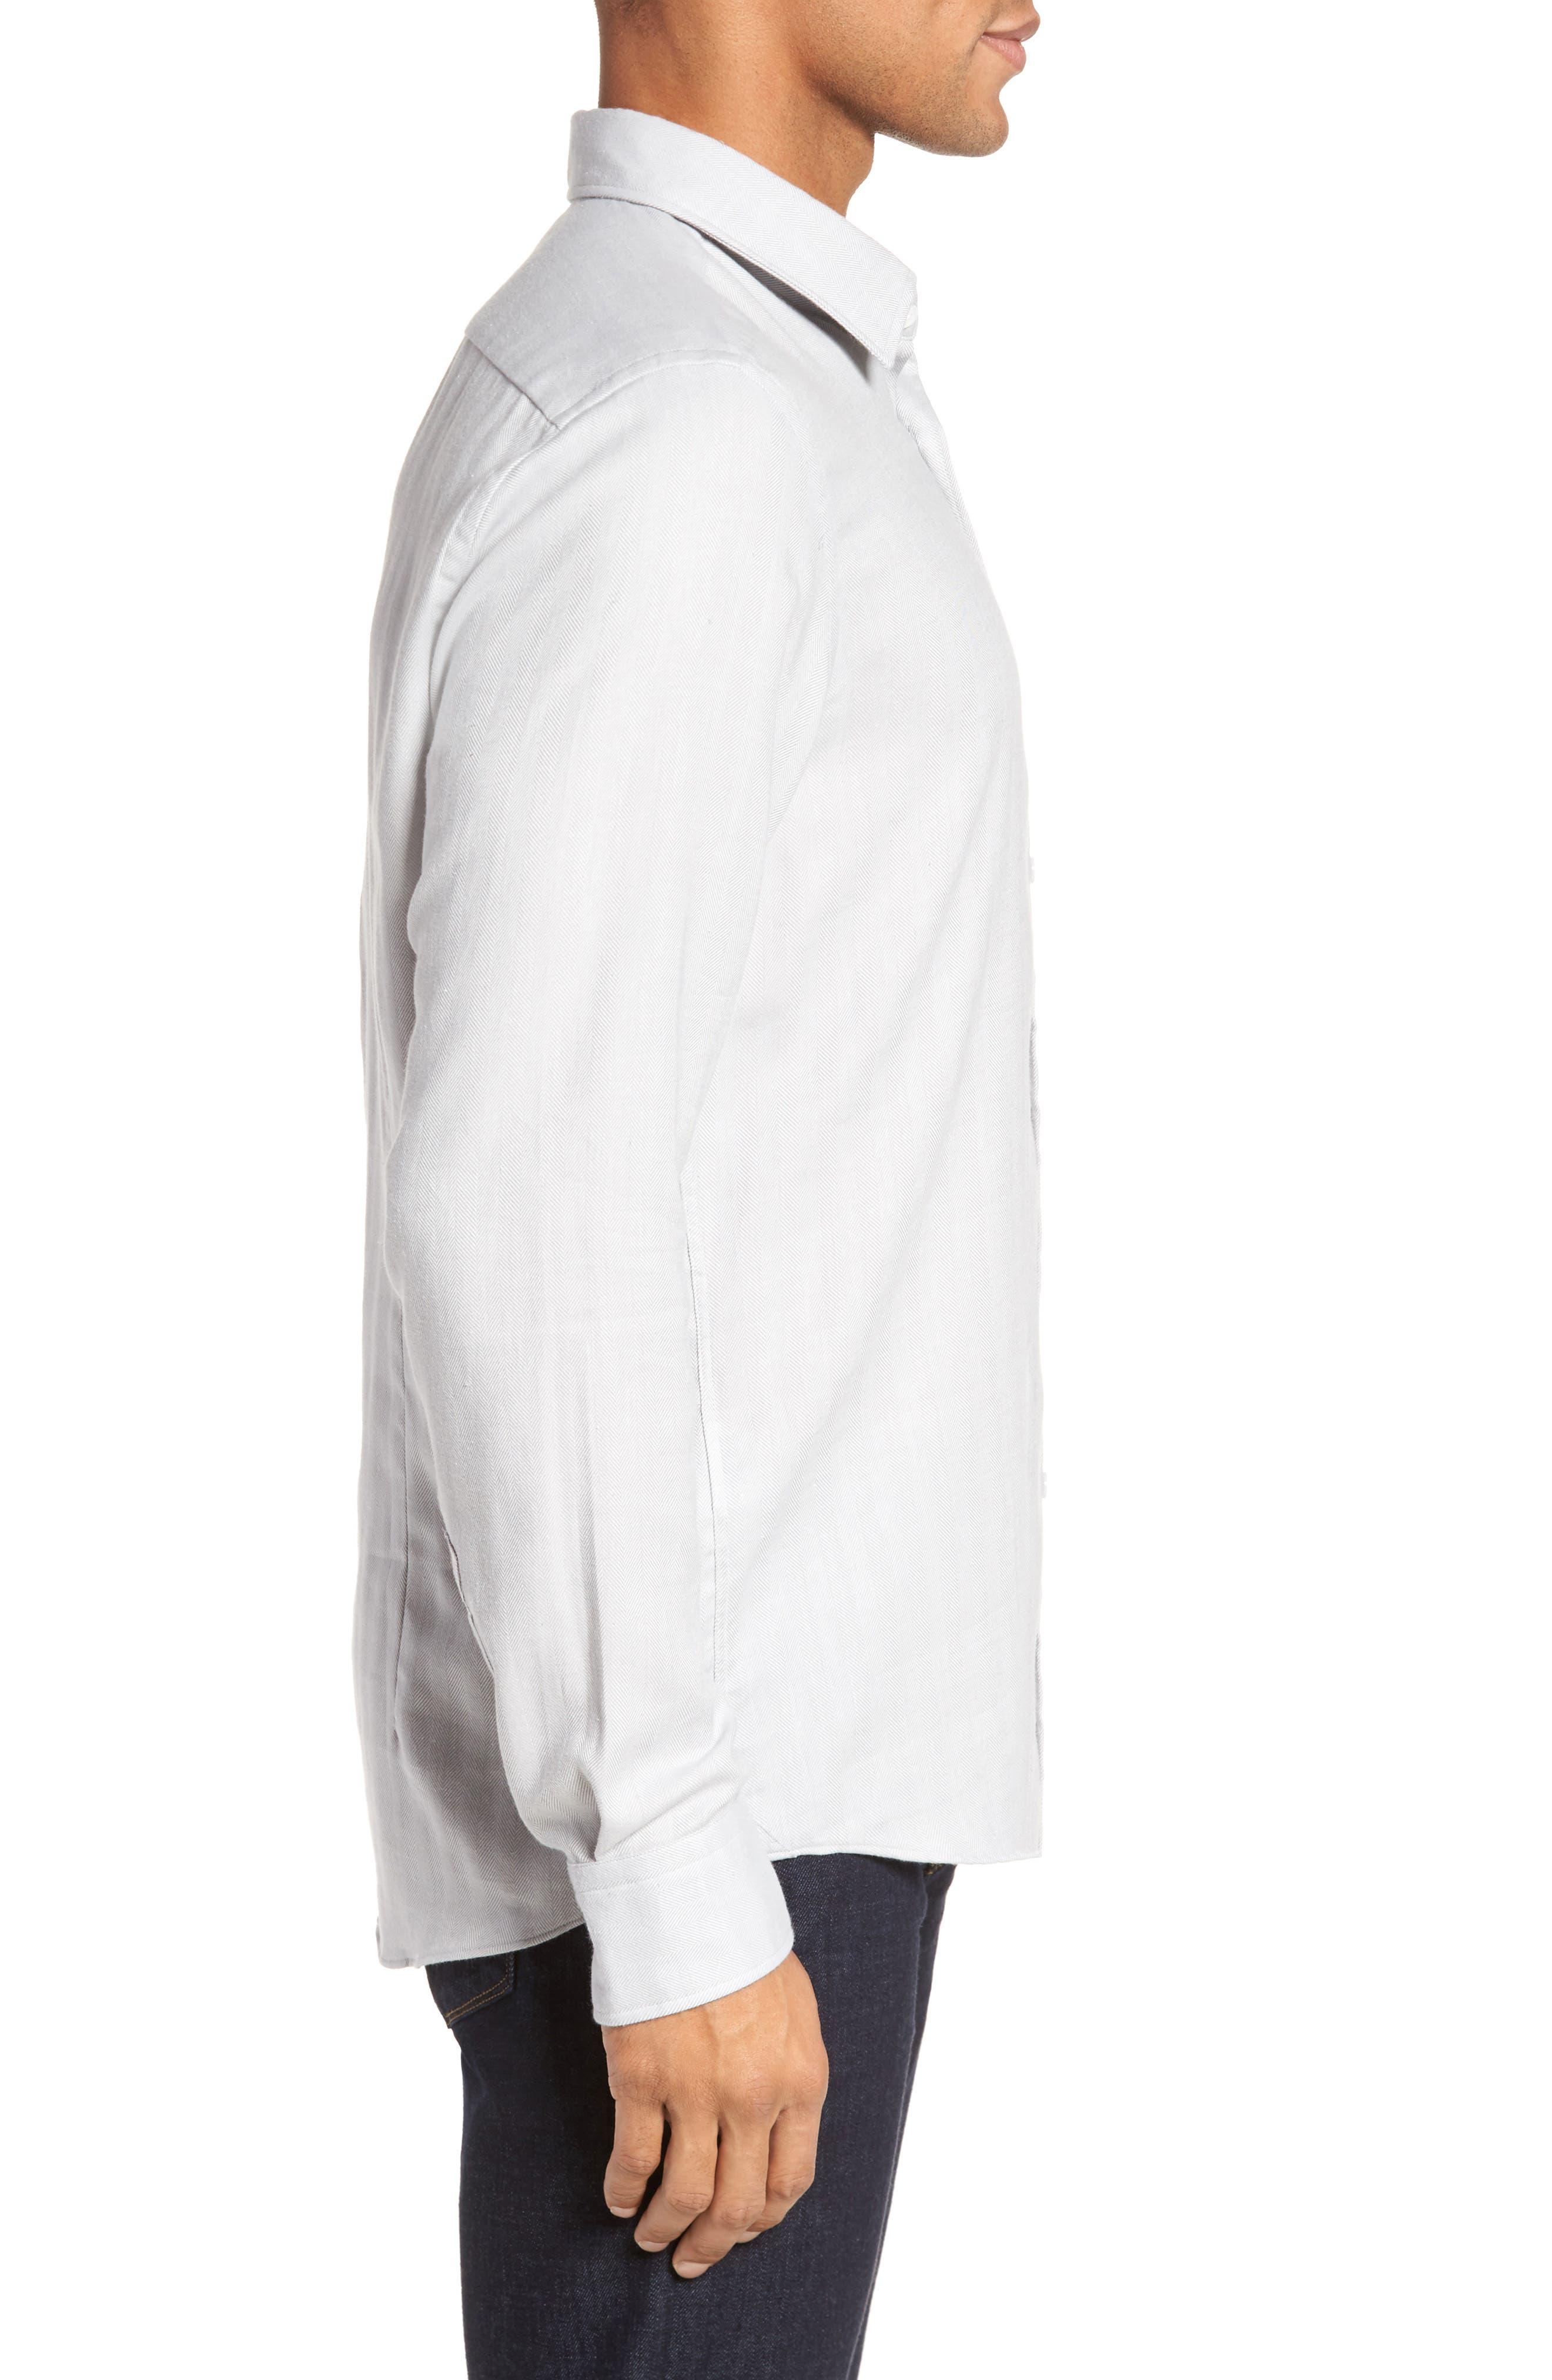 Landon Herringbone Shirt,                             Alternate thumbnail 3, color,